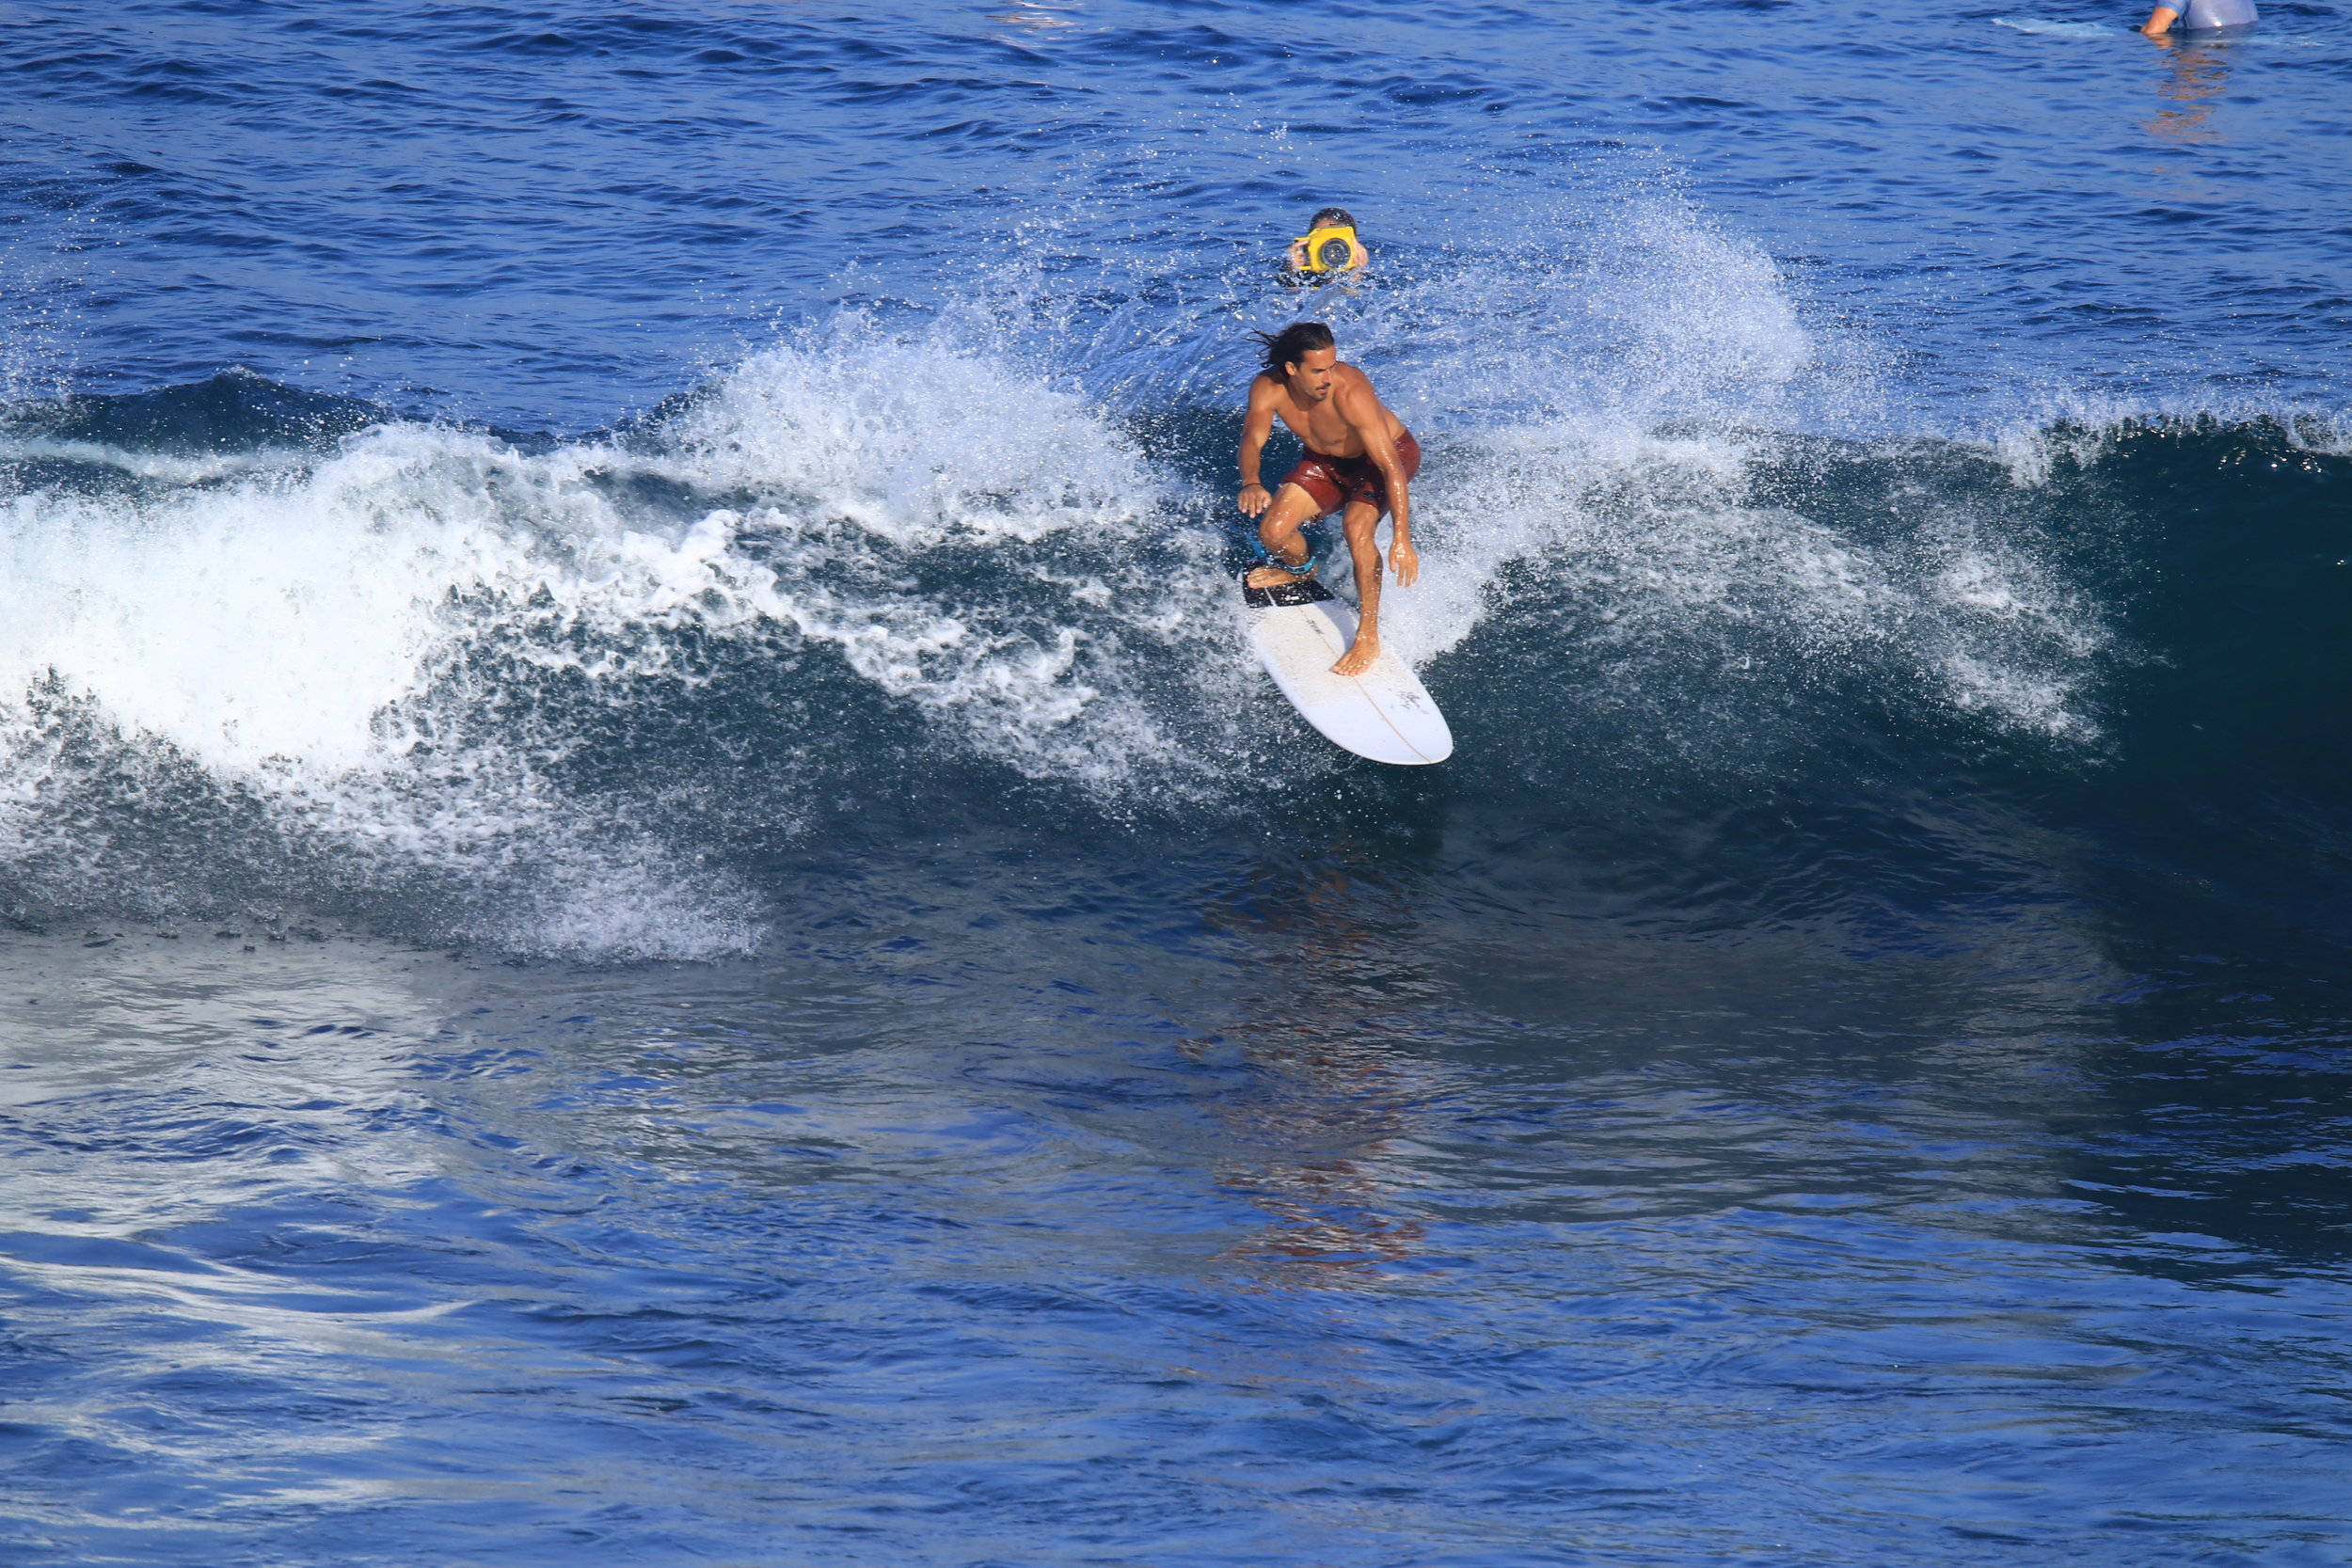 Mighty Otter Surfboards Lo Fi Indo Bali Lotta Surfs051A9595.JPG